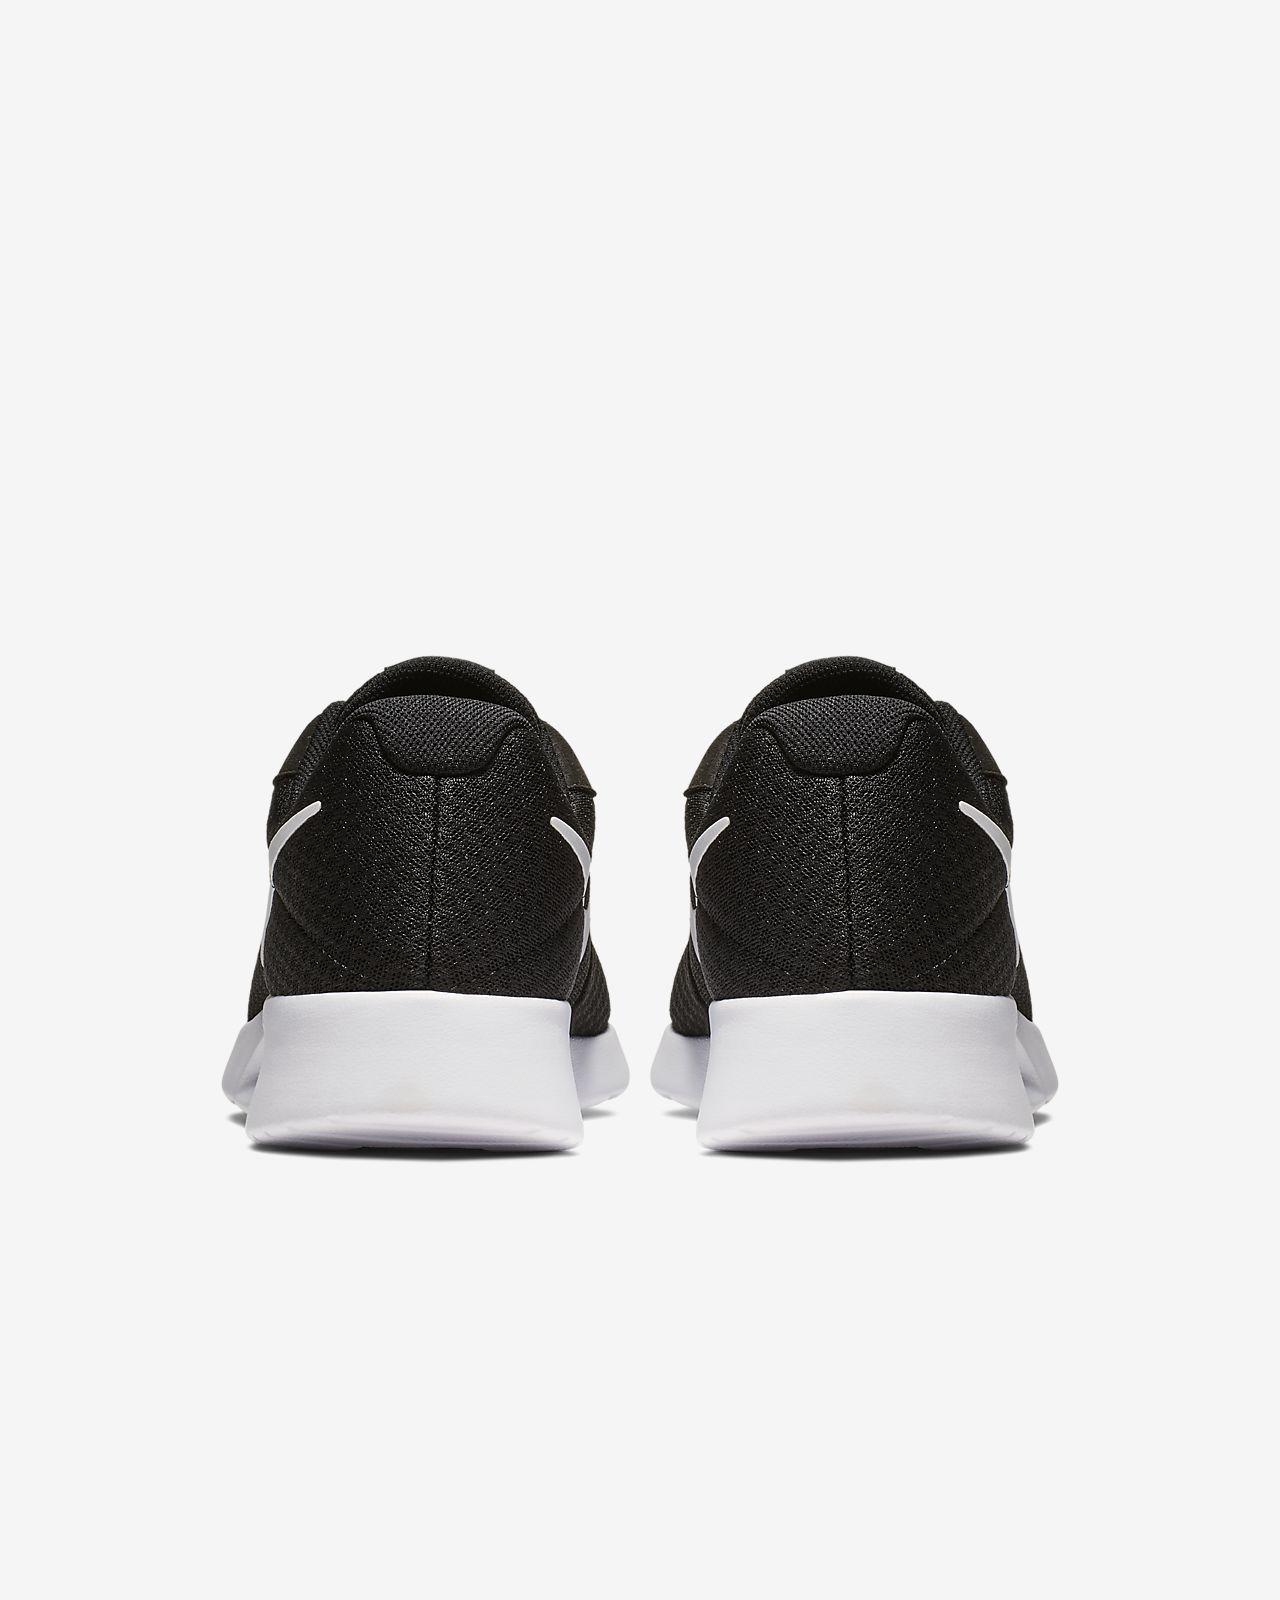 best loved 6dcd6 7d6c1 ... Chaussure Nike Tanjun pour Femme